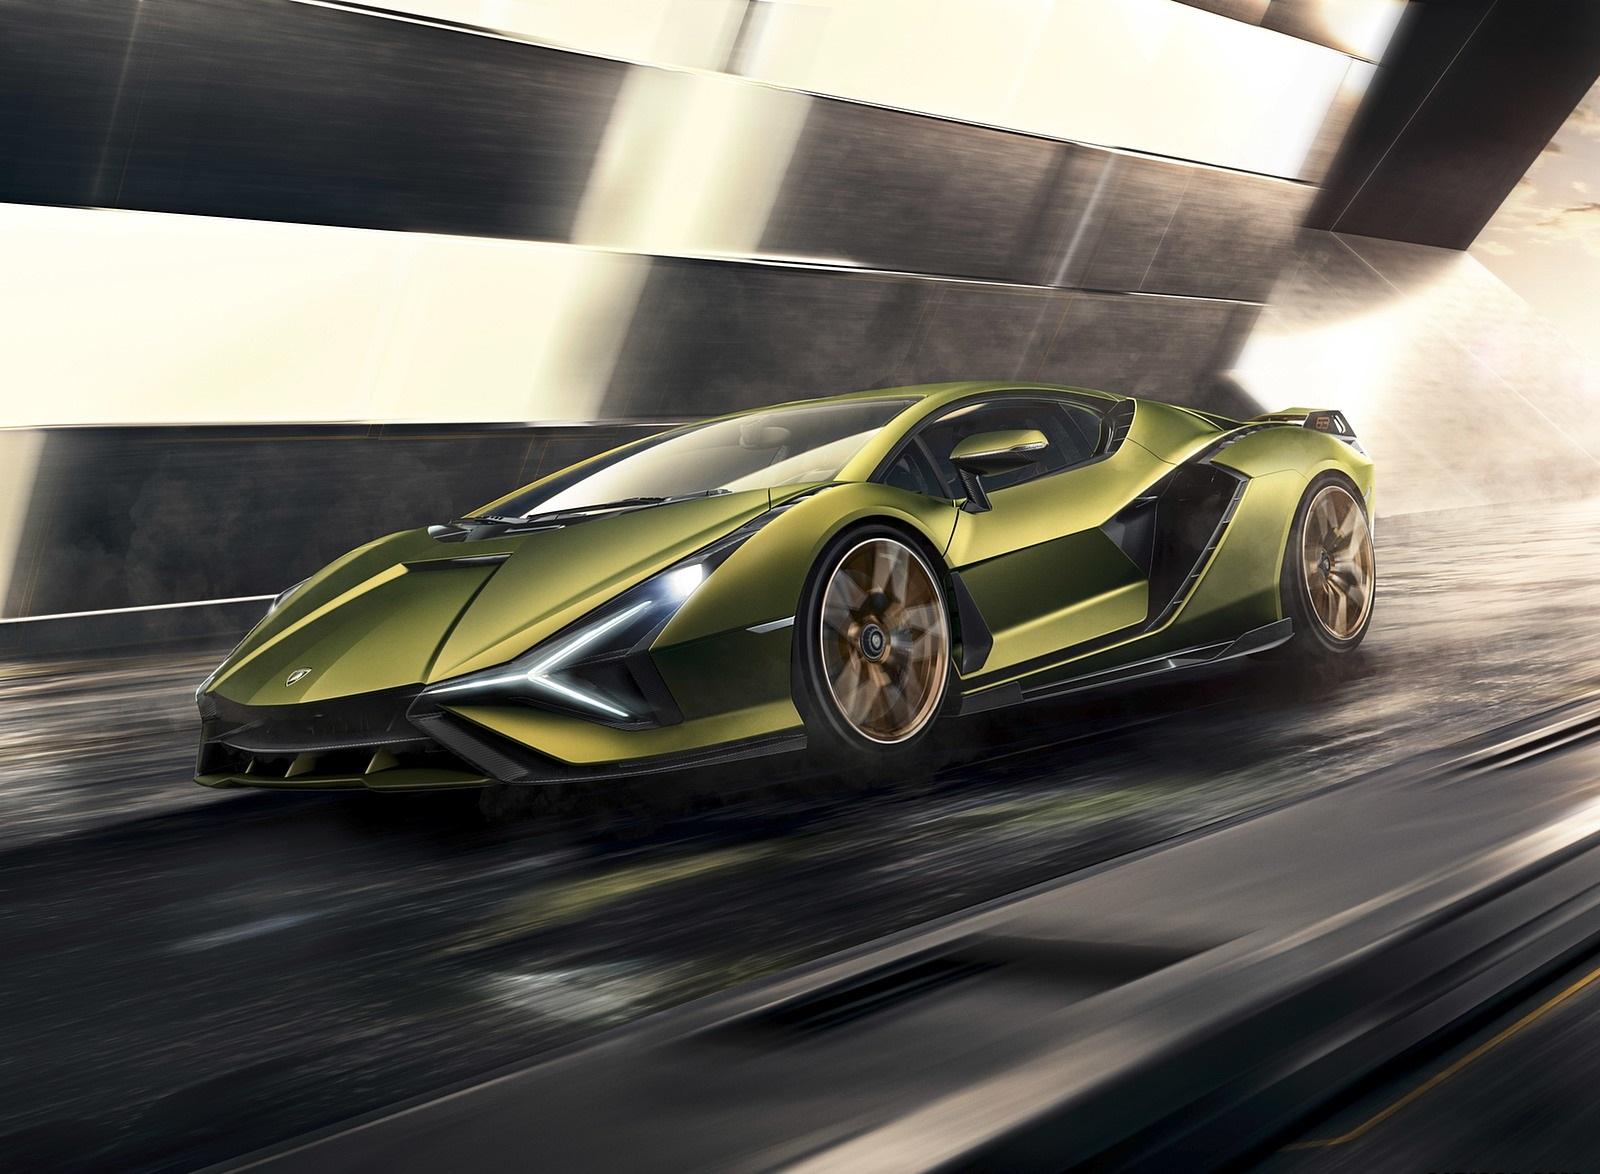 2020 Lamborghini Sián Front Three-Quarter Wallpapers (1)